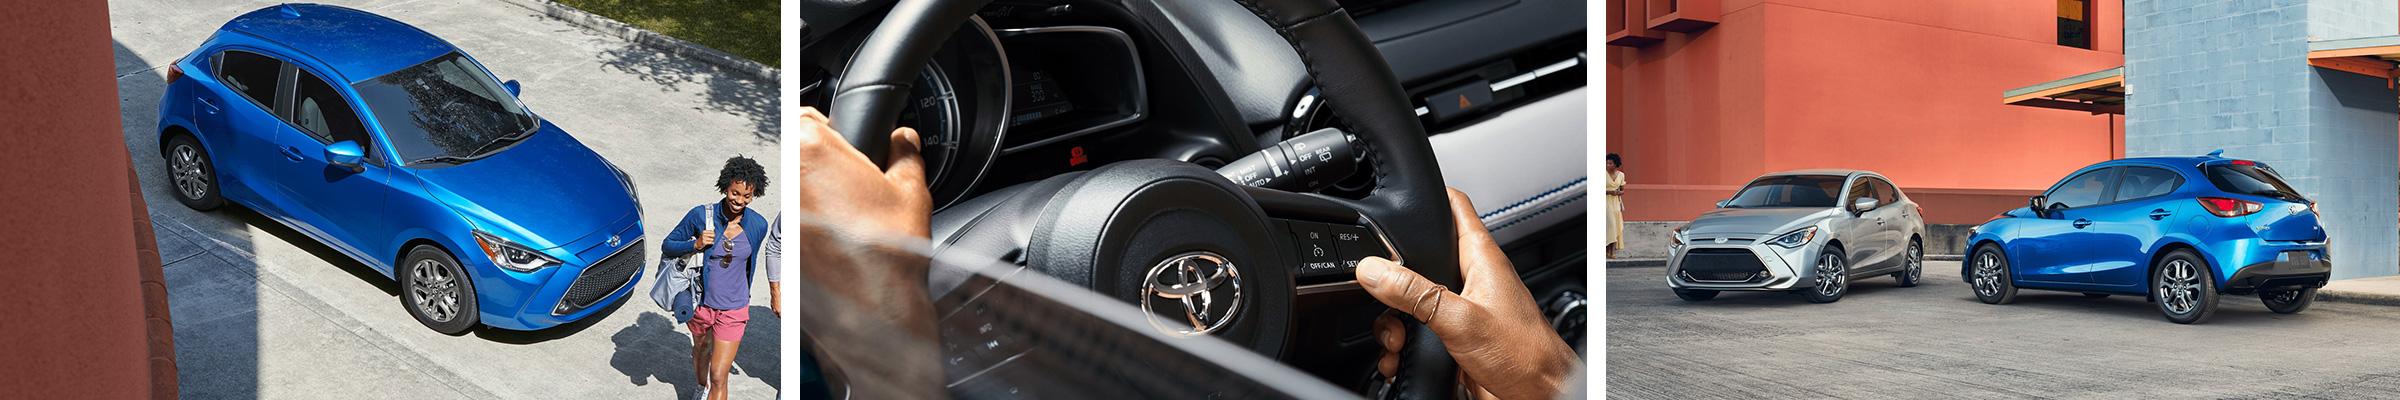 2020 Toyota Yaris Hatchback For Sale Milwaukee WI | Oak Creek